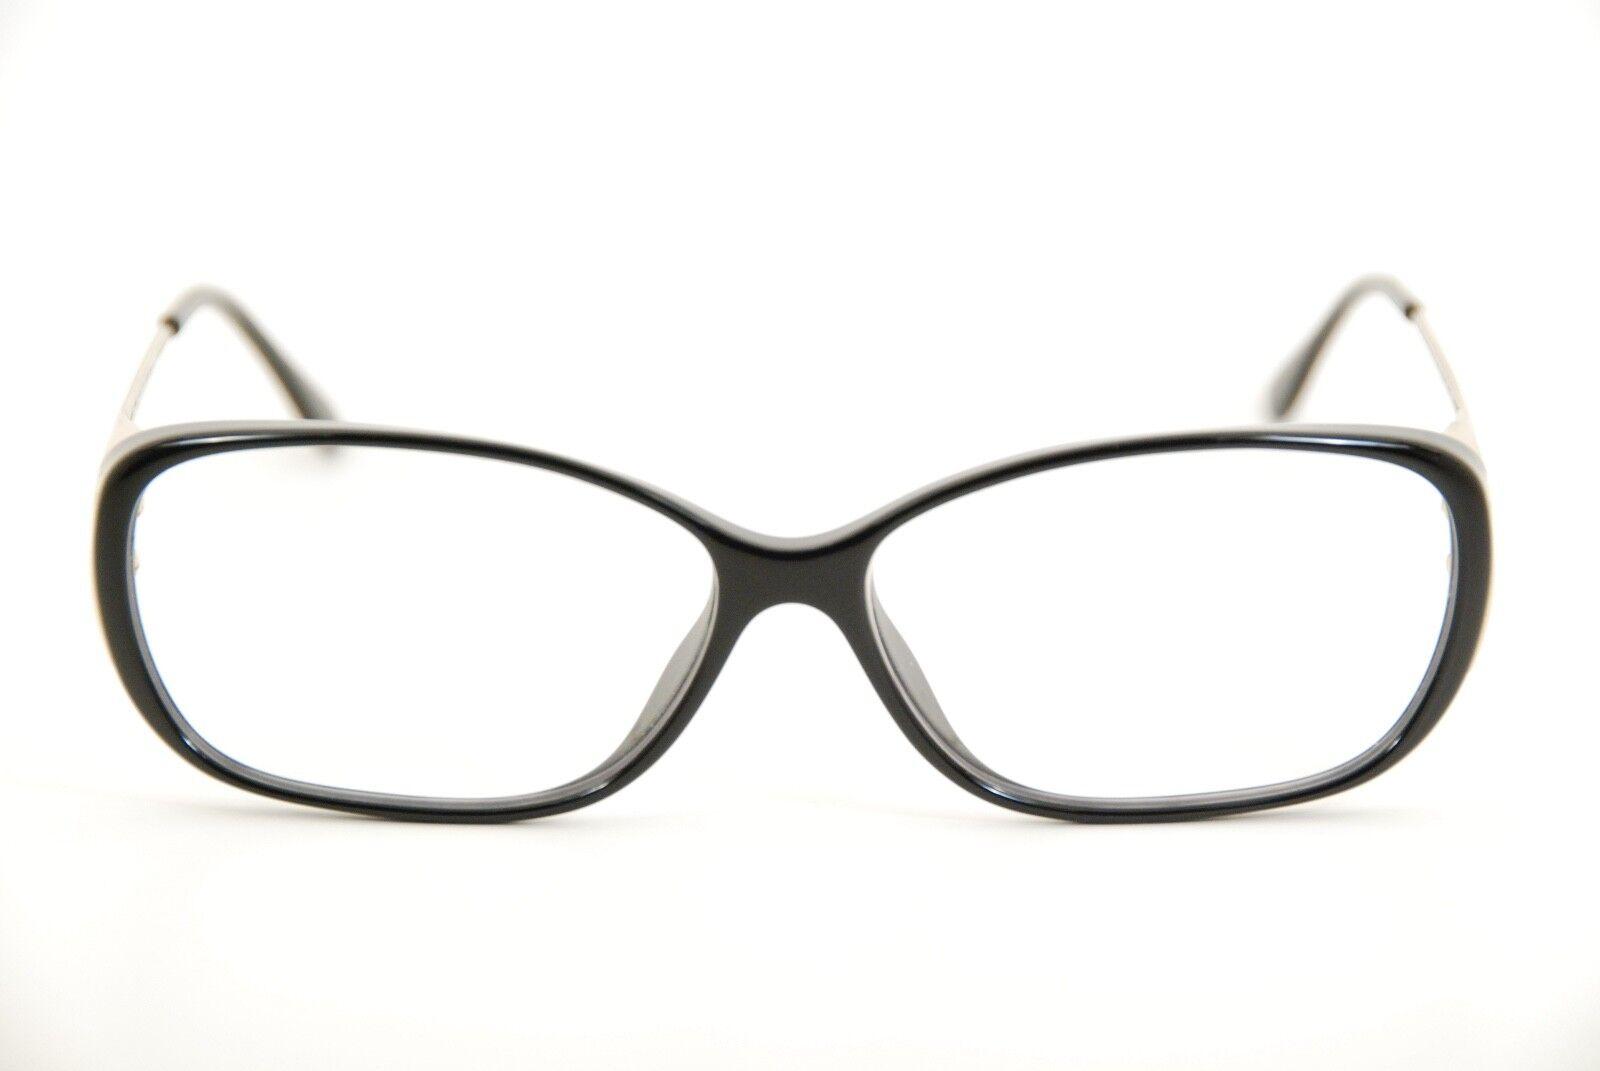 1a20f14fabe Authentic Fendi F 969 001 Black pale Gold 55mm Frames Eyeglasses ...